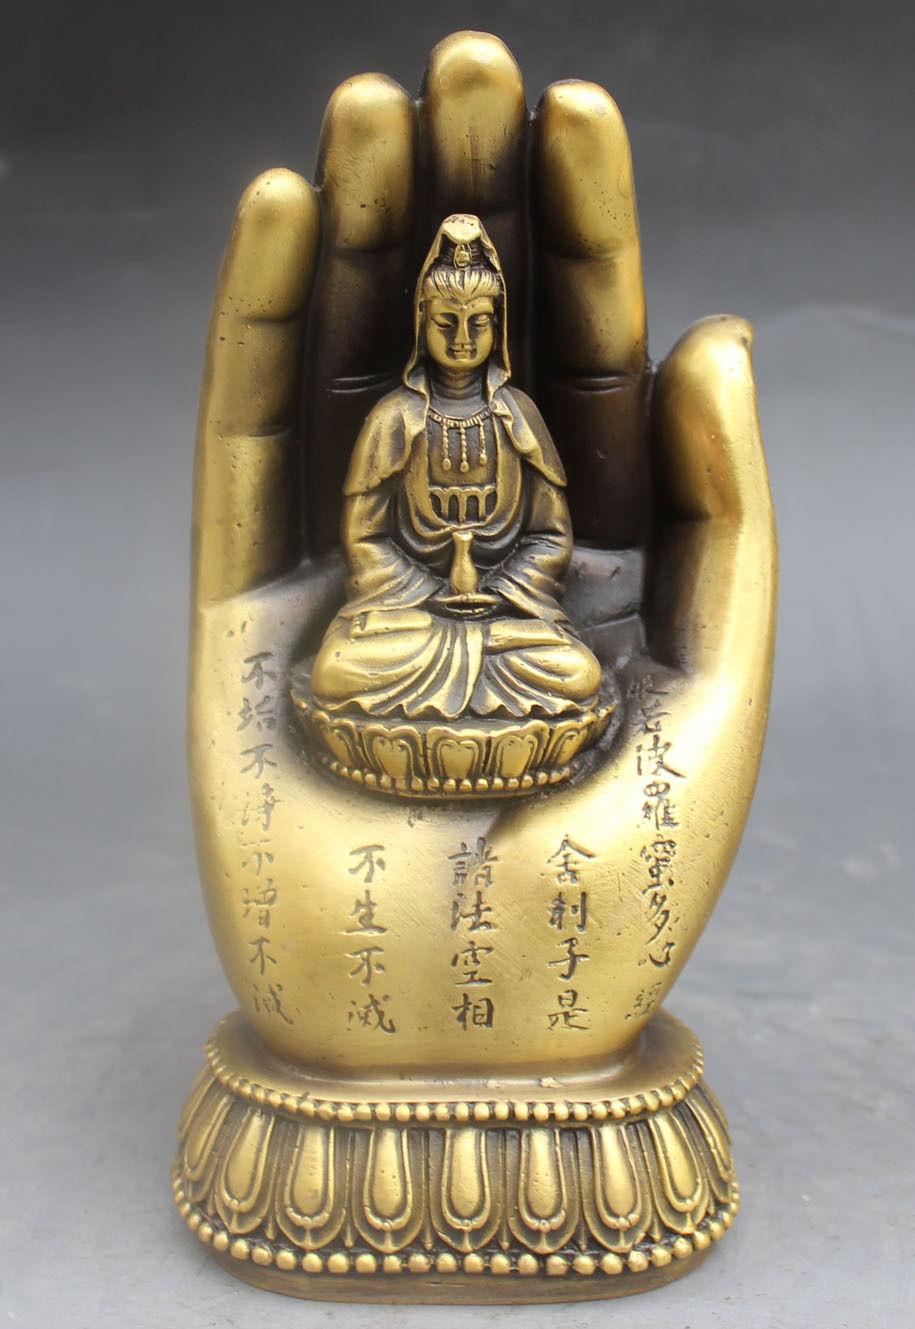 Chinese Buddhism Bronze Kwan-yin Bodhisattva Goddess Hand Buddha Statue metal handicraftChinese Buddhism Bronze Kwan-yin Bodhisattva Goddess Hand Buddha Statue metal handicraft